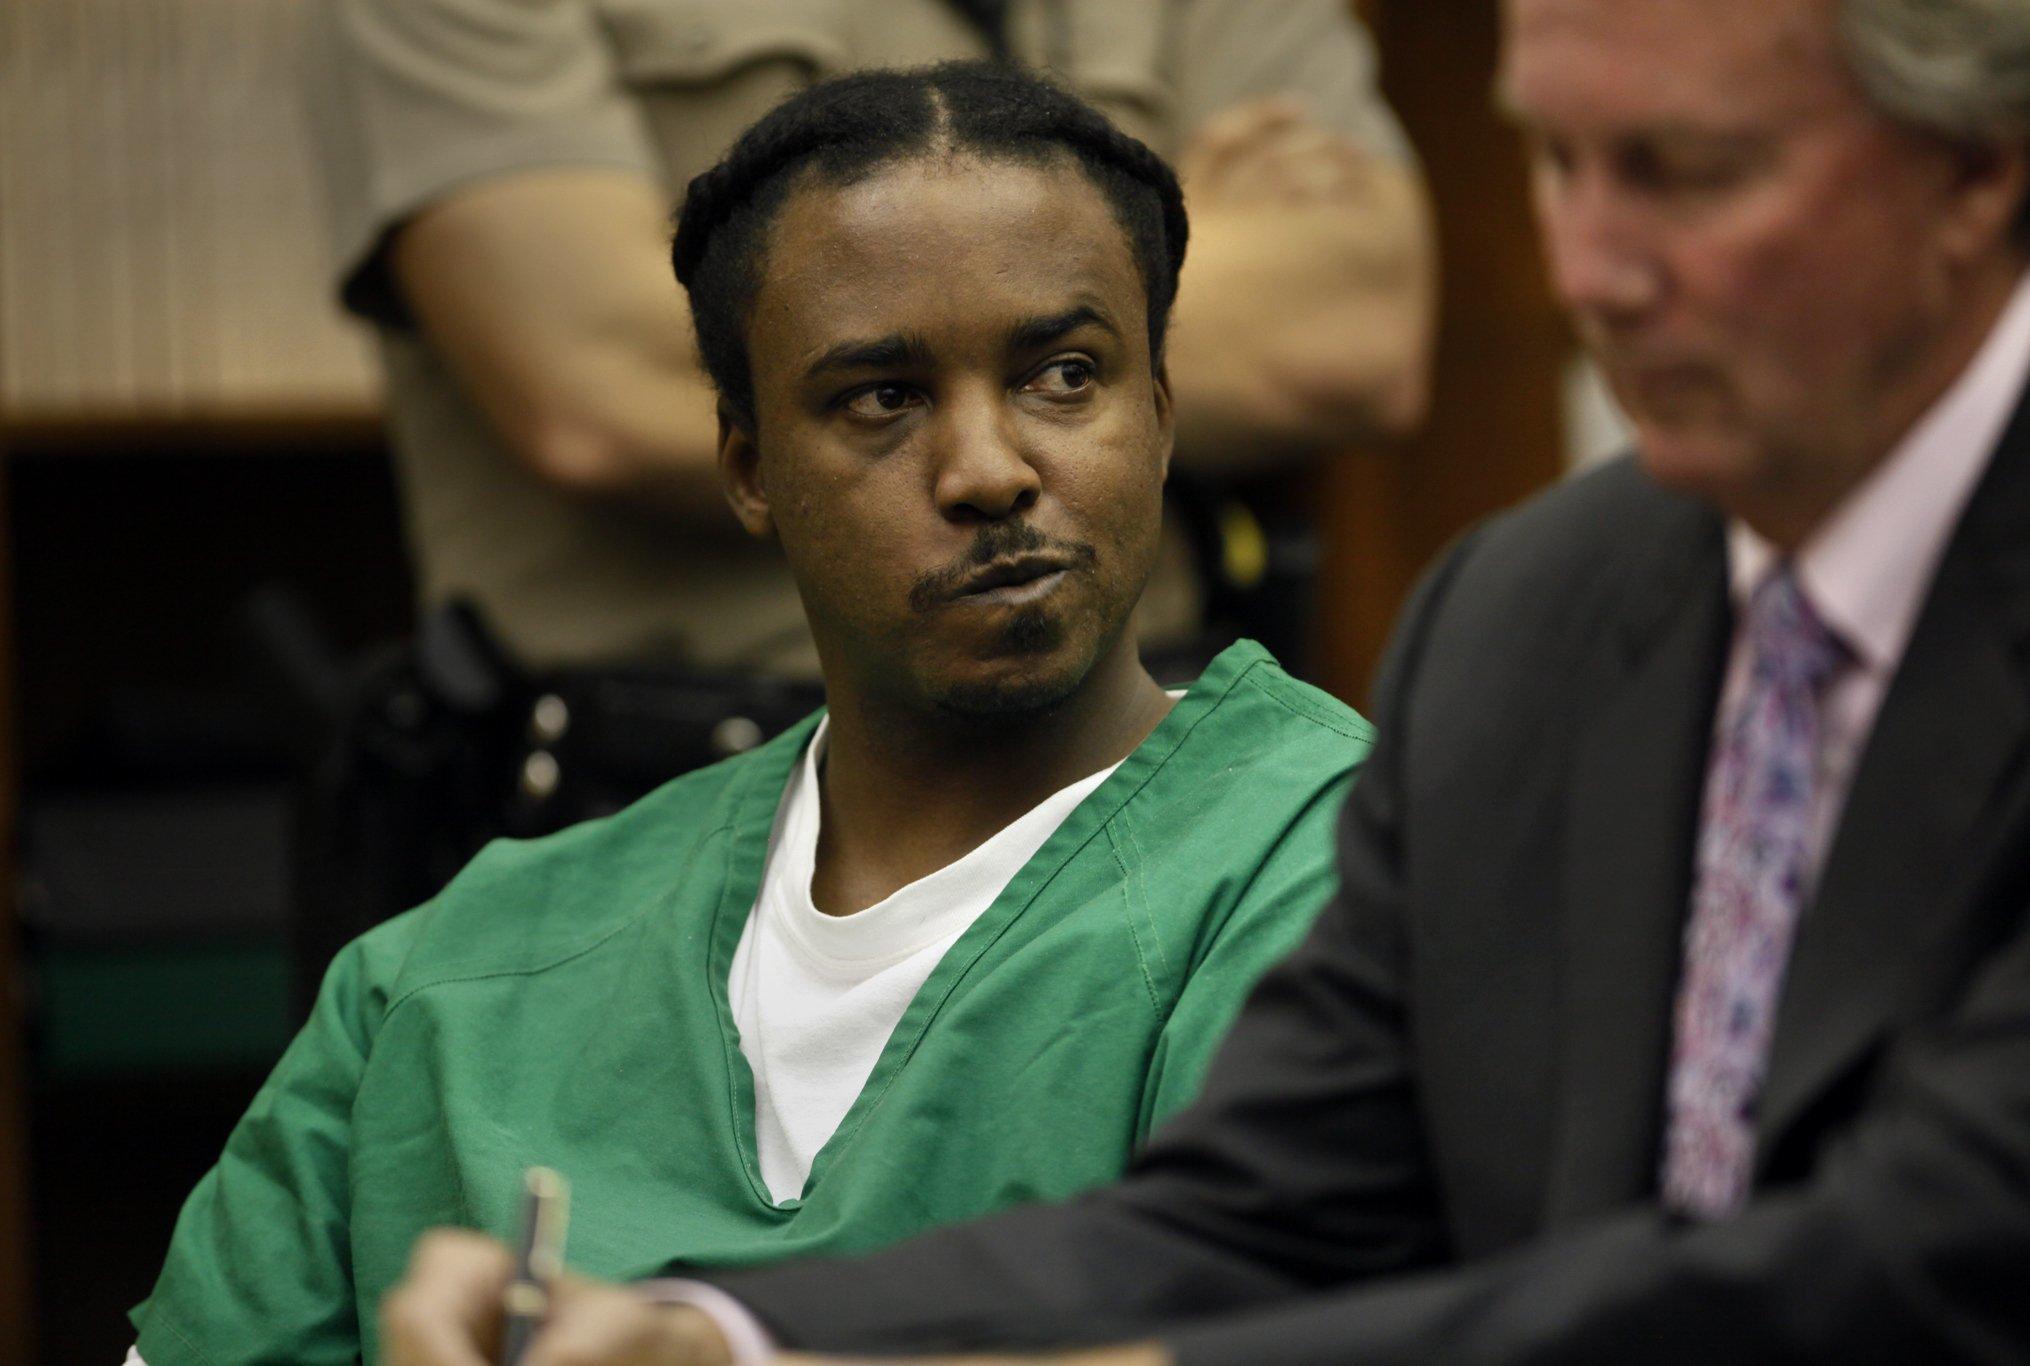 Liquor store killer gets life in prison - The San Diego ...